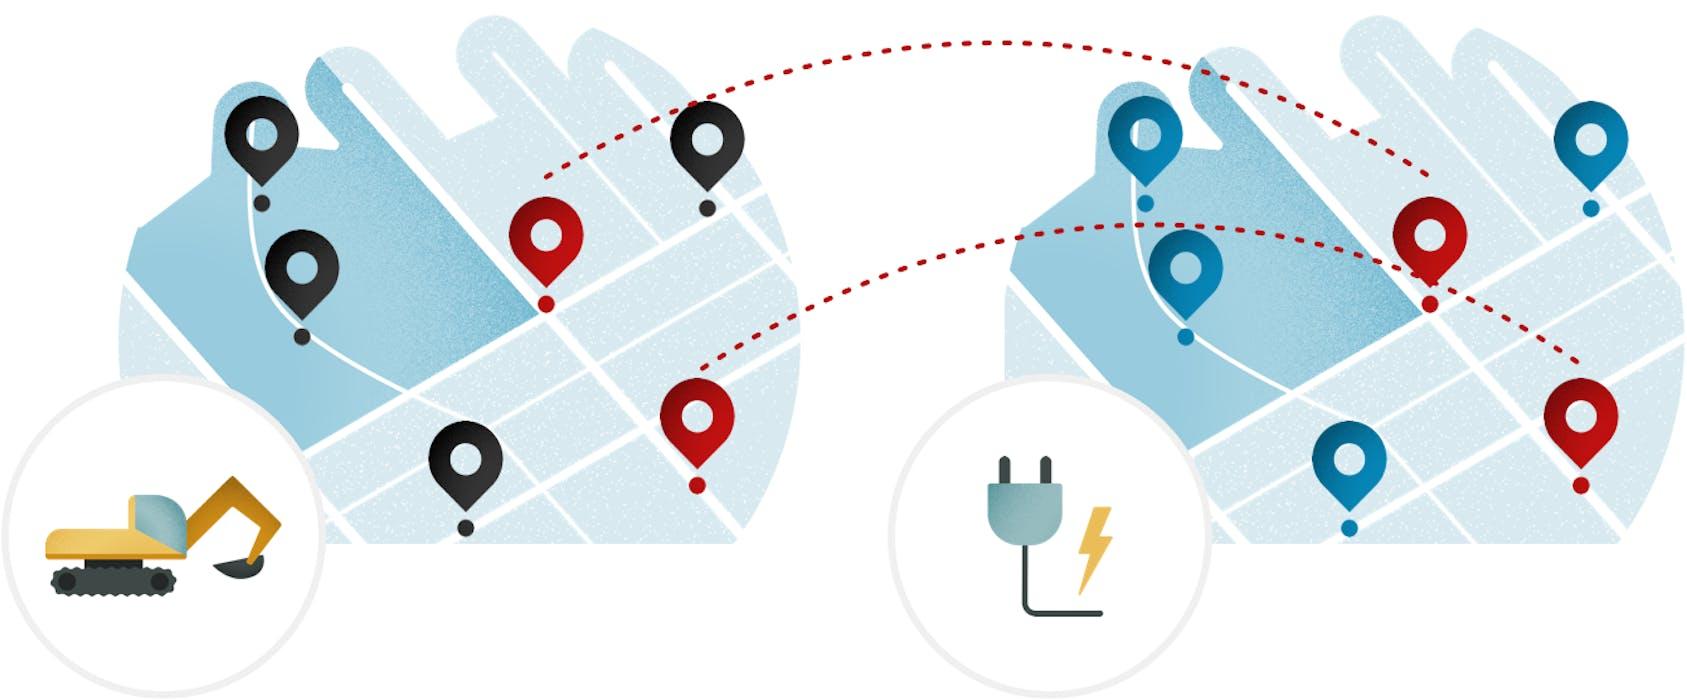 SaferMe shares data across company borders